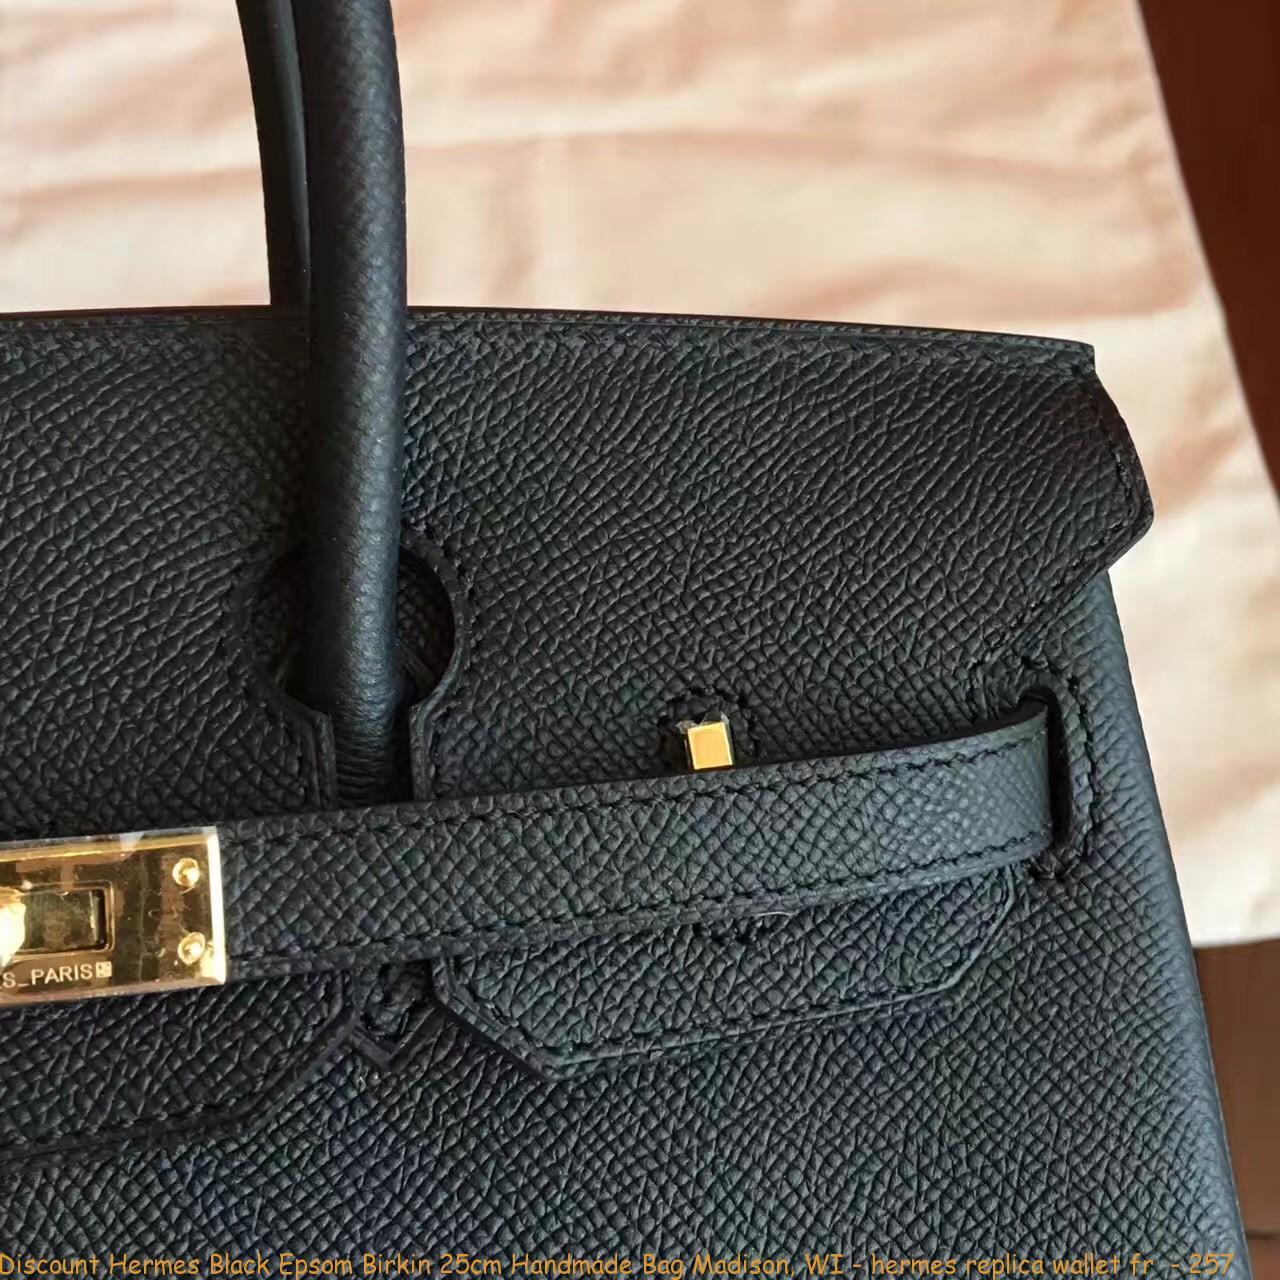 Discount Hermes Black Epsom Birkin 25cm Handmade Bag Madison 6460891fb556c